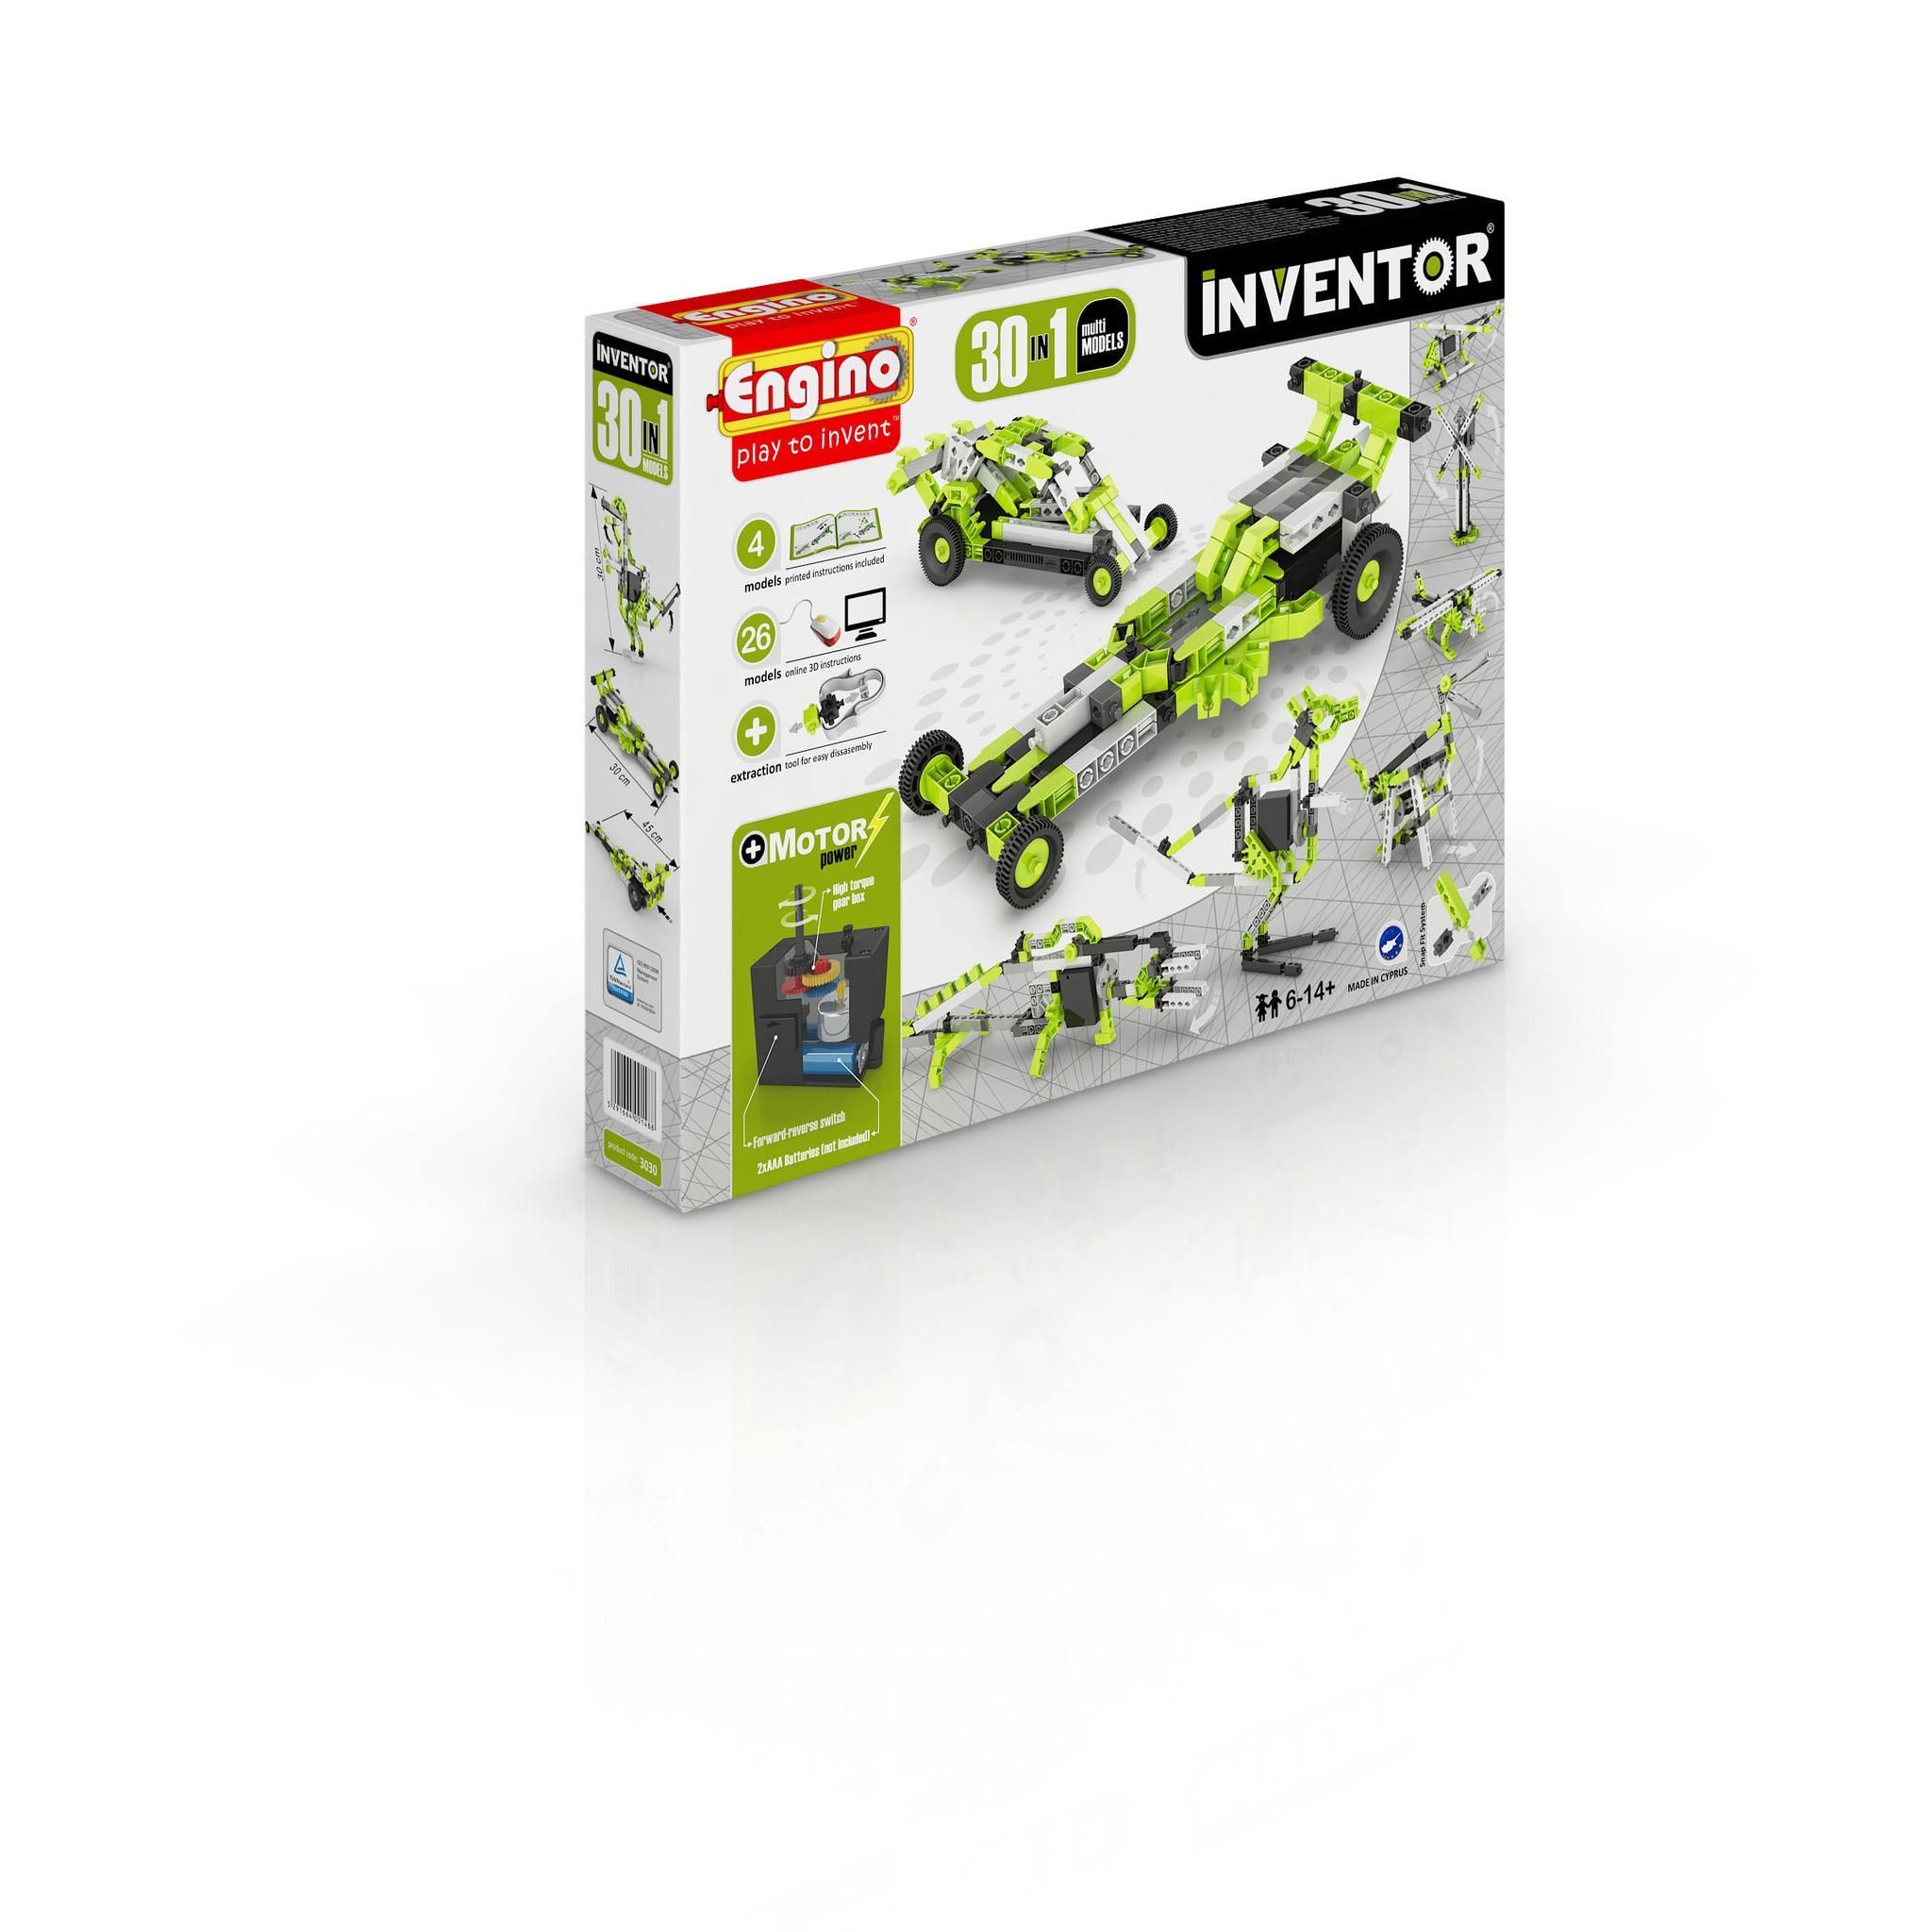 engino_inventor_30_models_pack.jpg